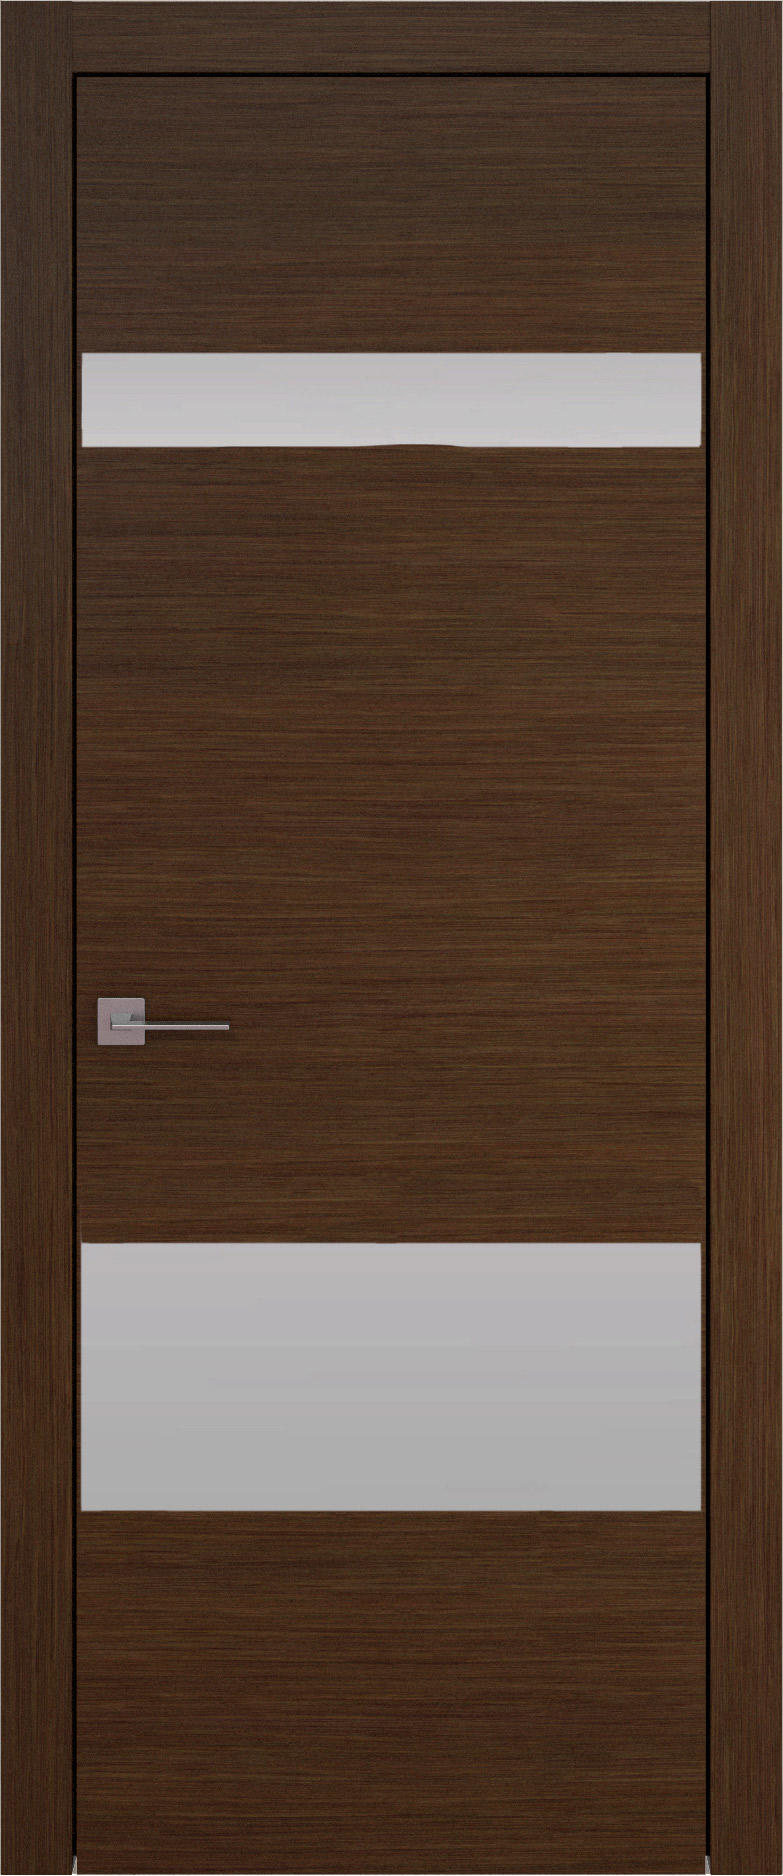 Tivoli К-4 цвет - Венге Без стекла (ДГ)